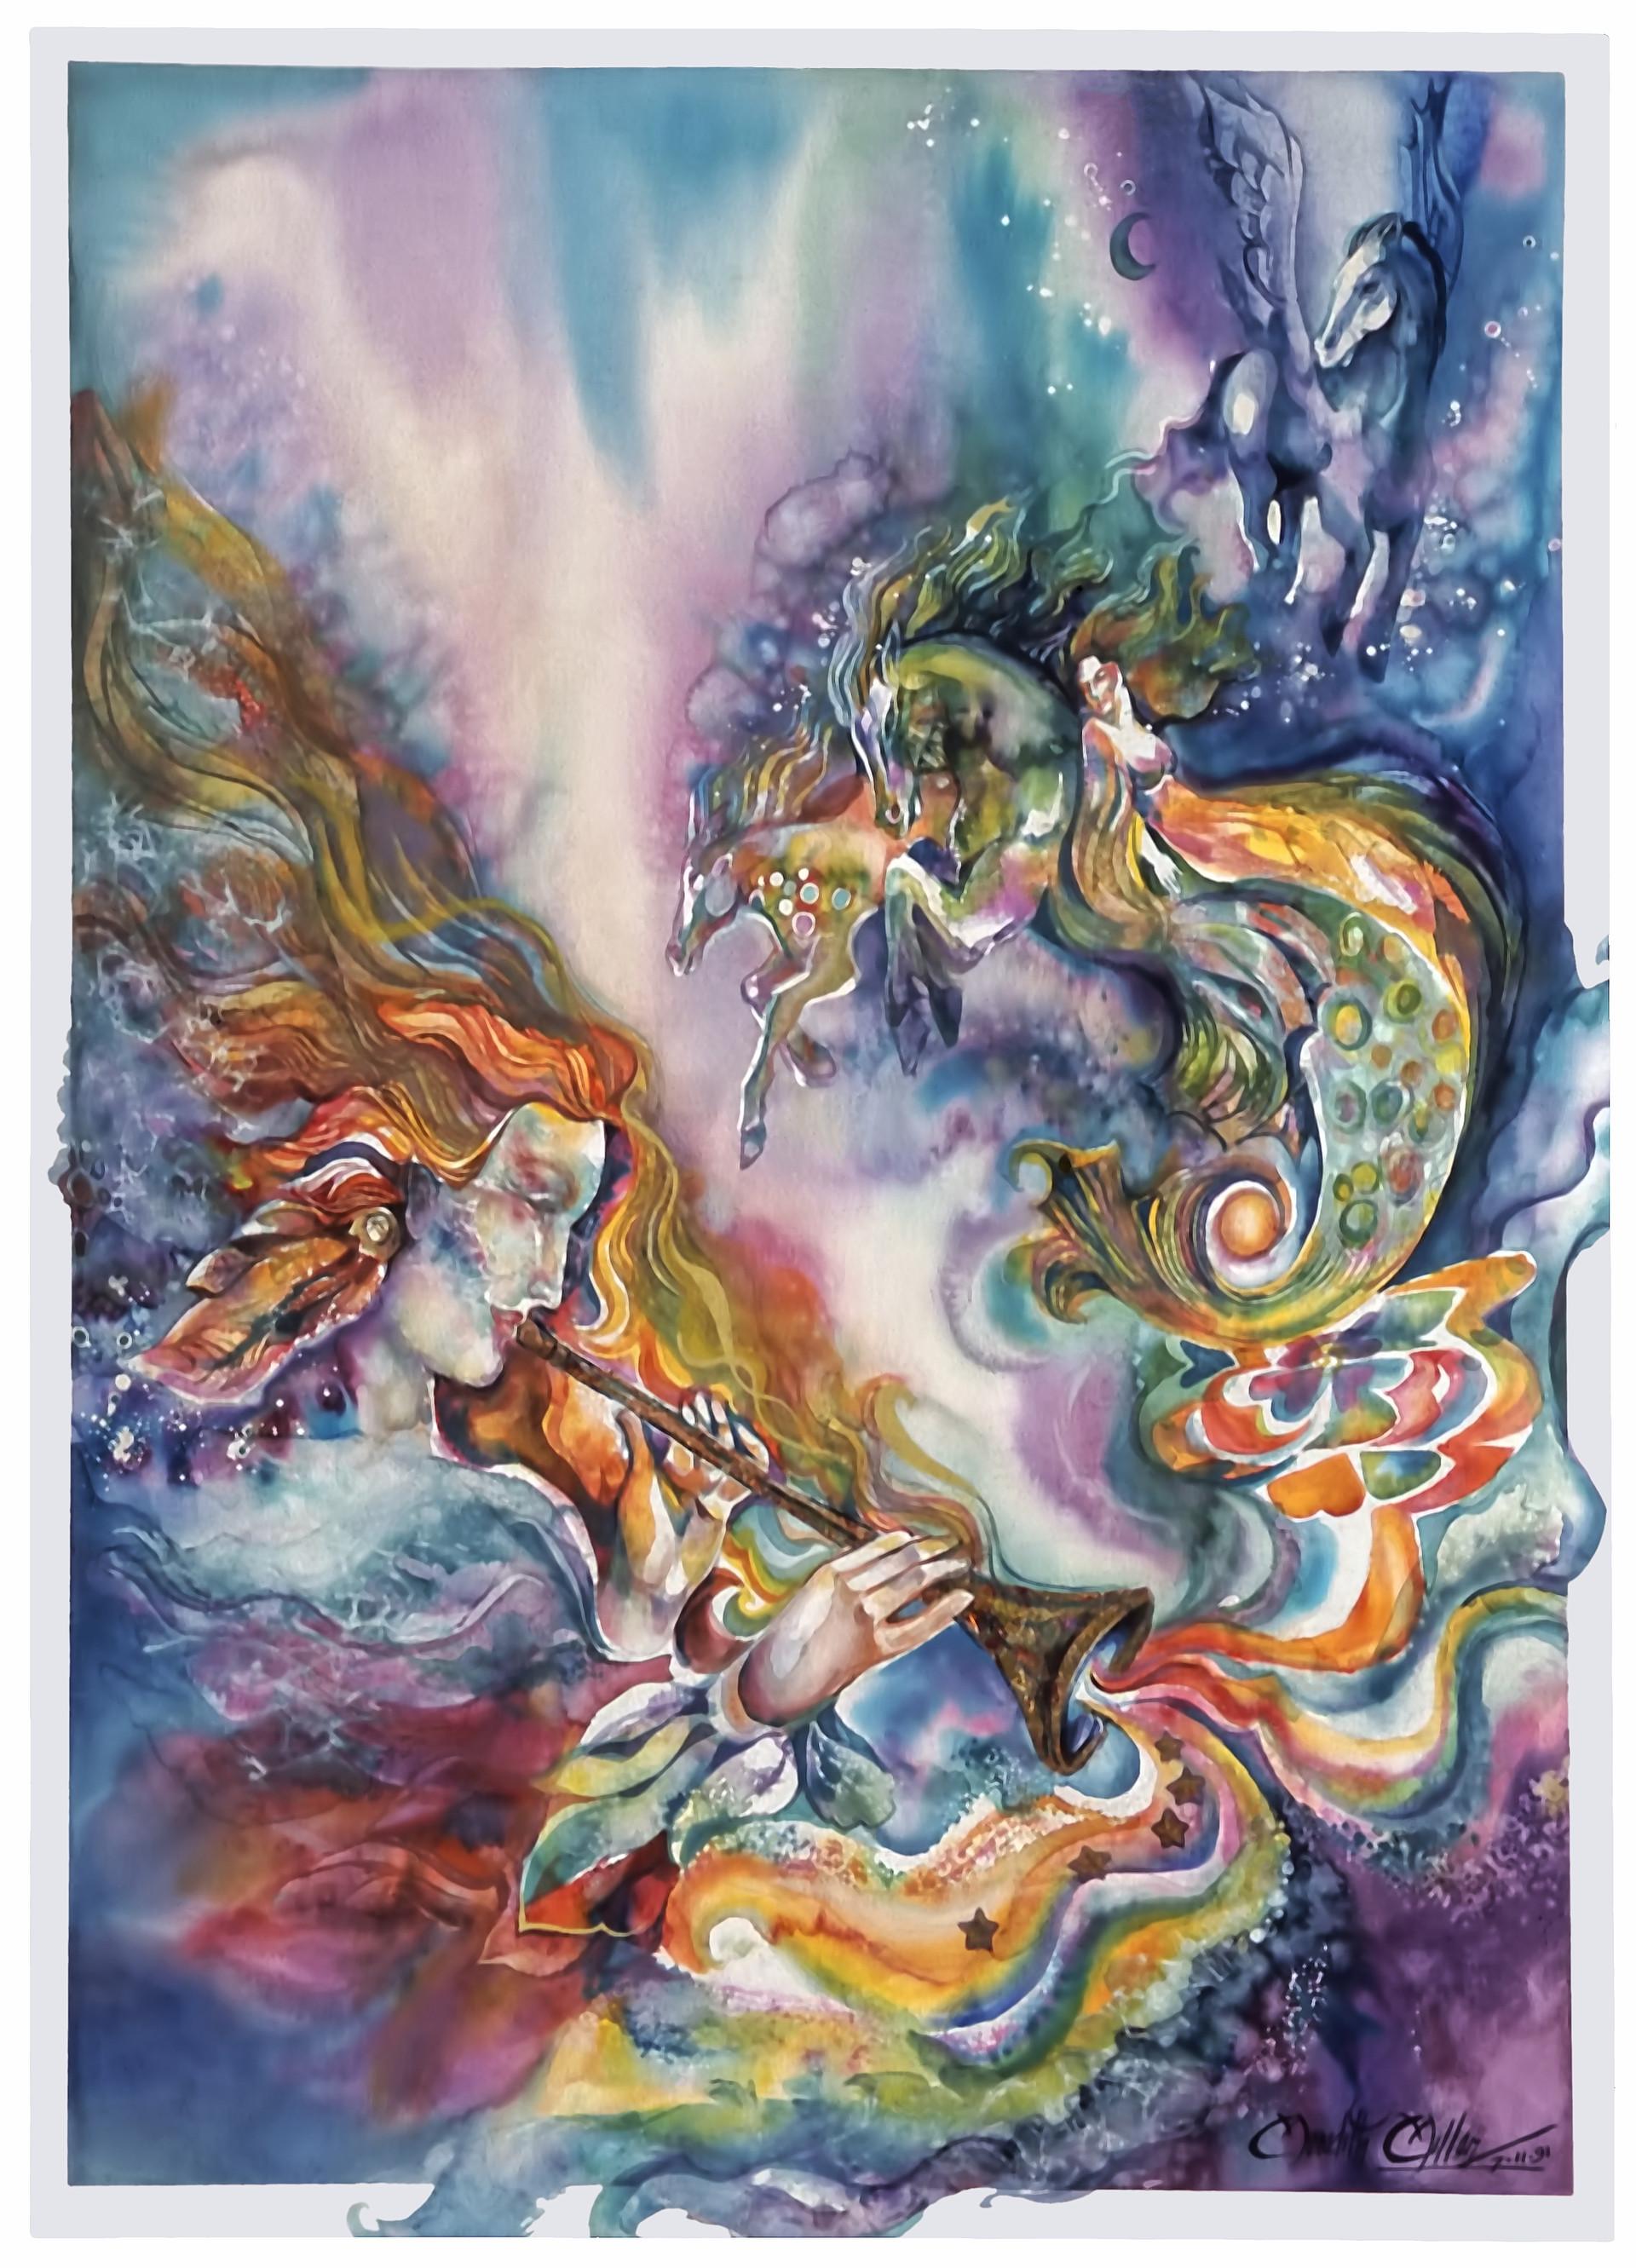 1991 - HERALDER OF DREAMS - Watercolor and Oil - 30X40